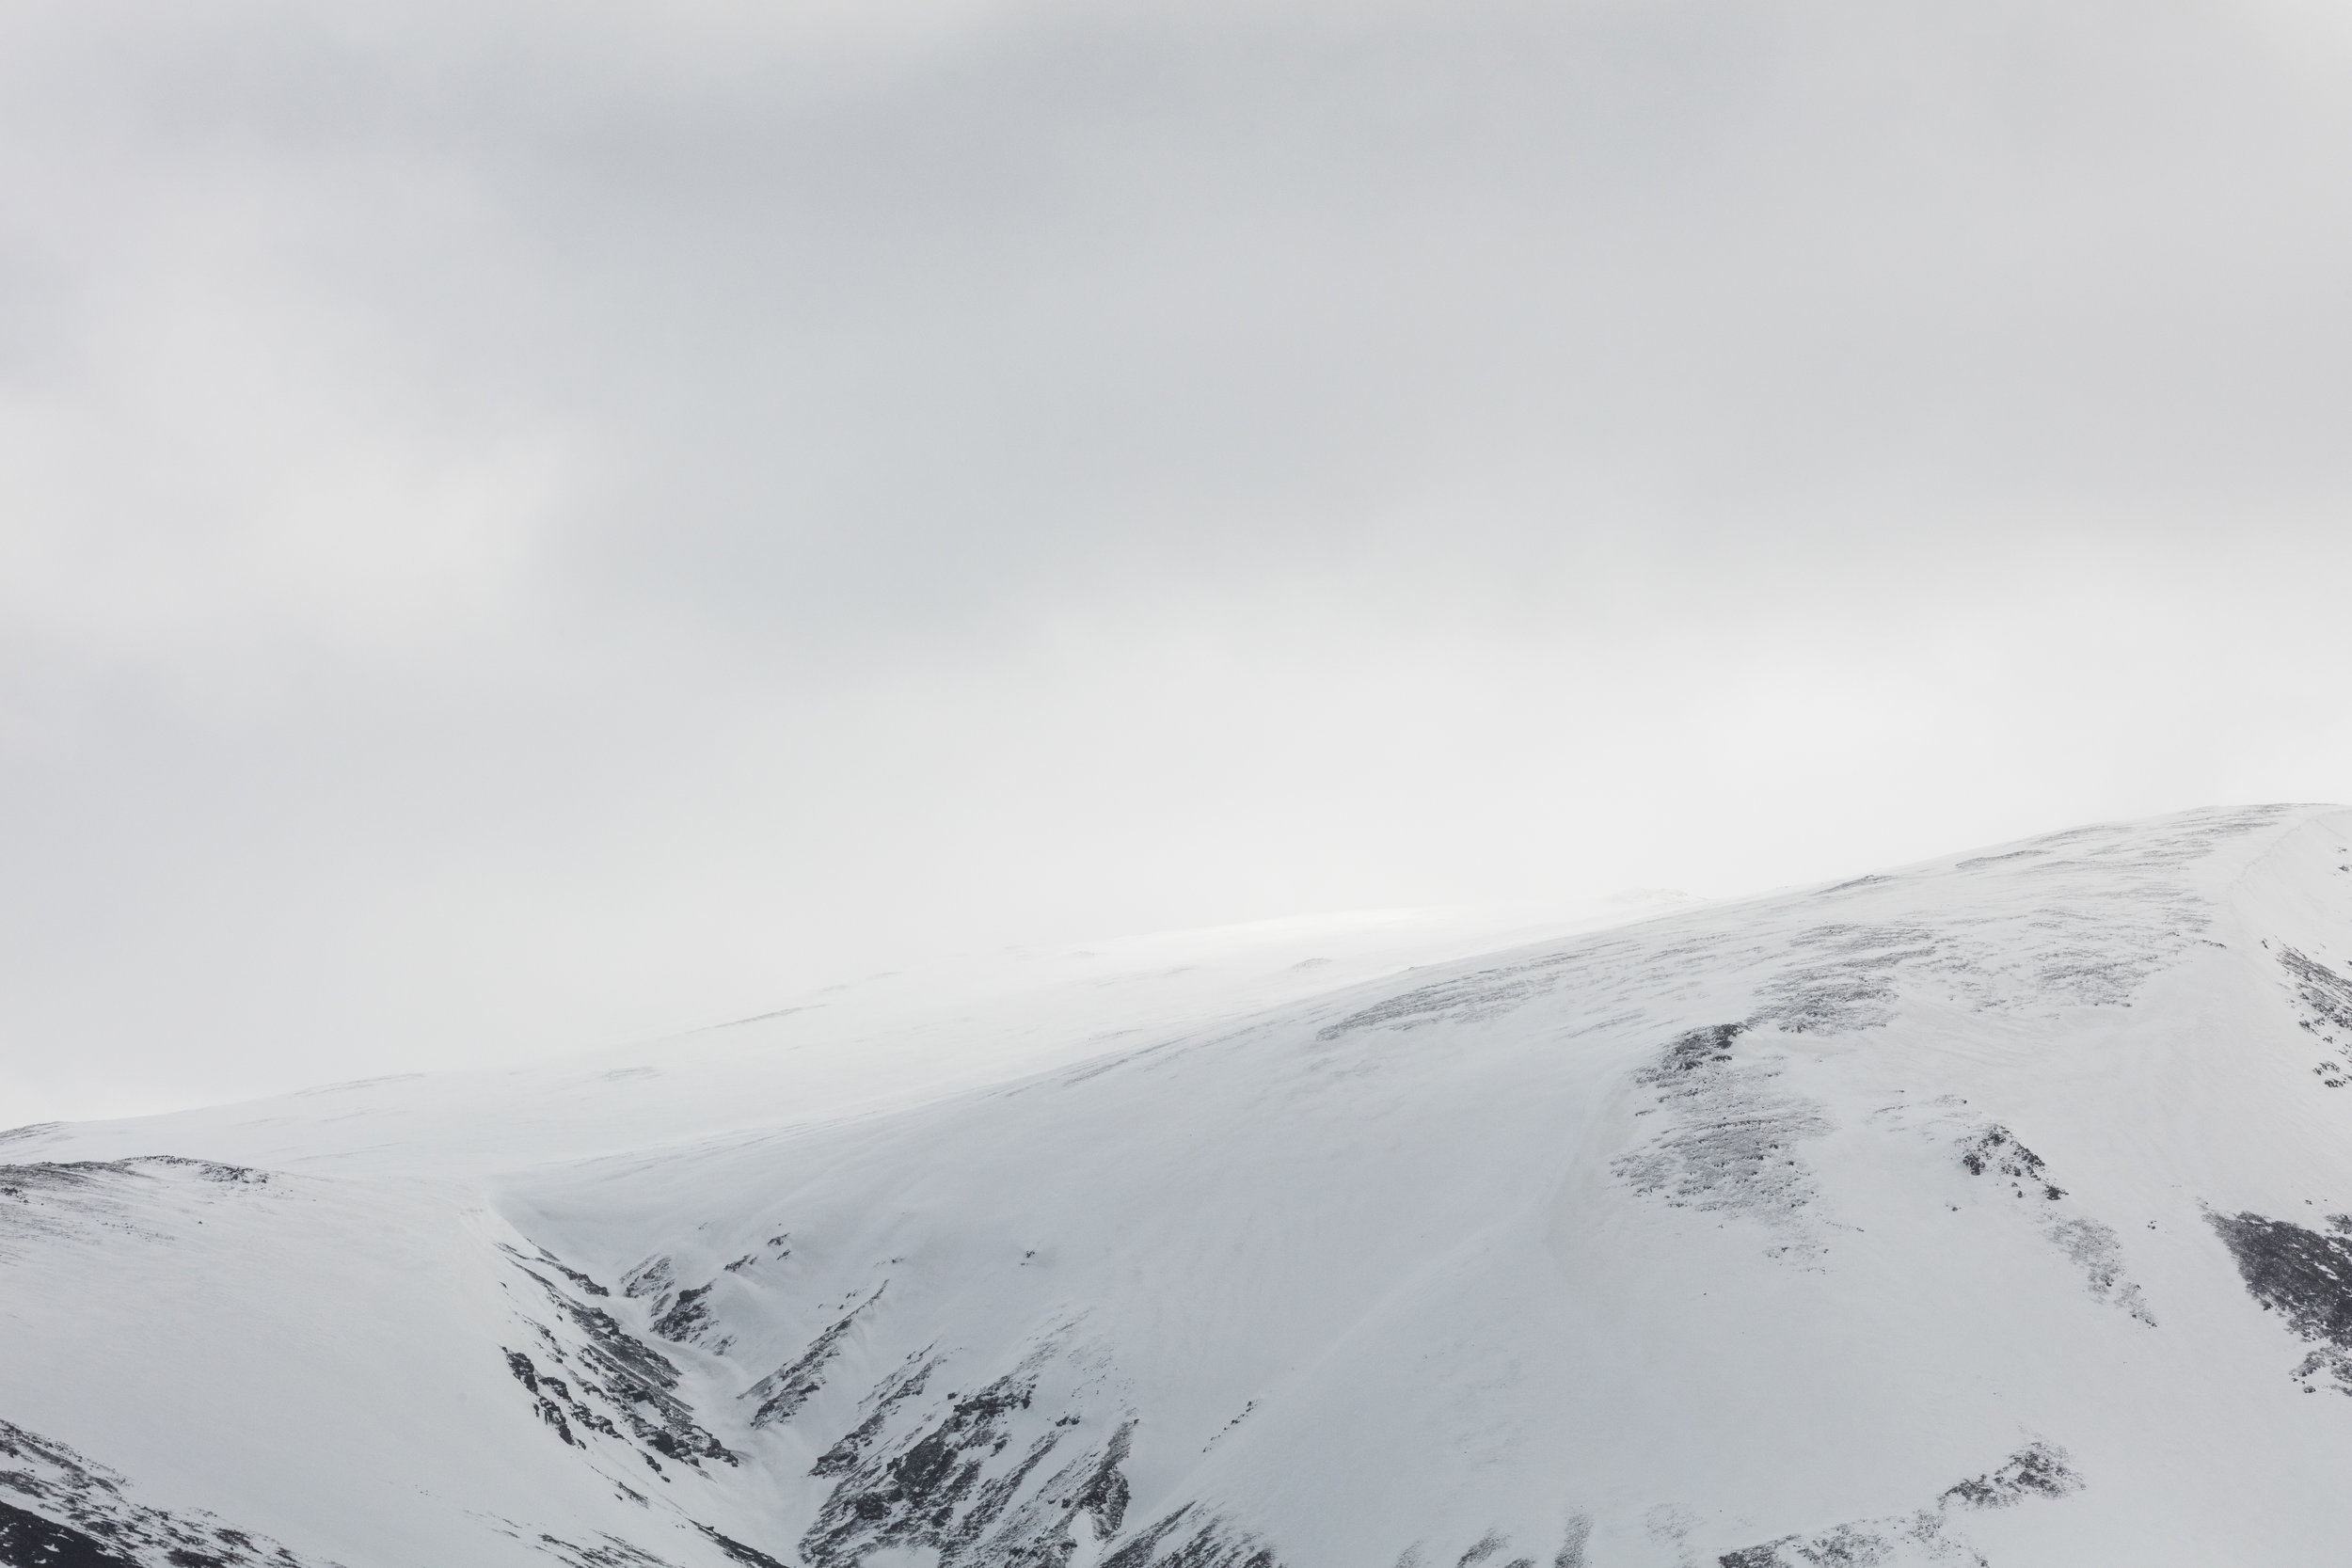 Misty+Snow+Capped+Mountain+Peaks,+Iceland+|+The+Fox+Plateau+-+Faune.jpg